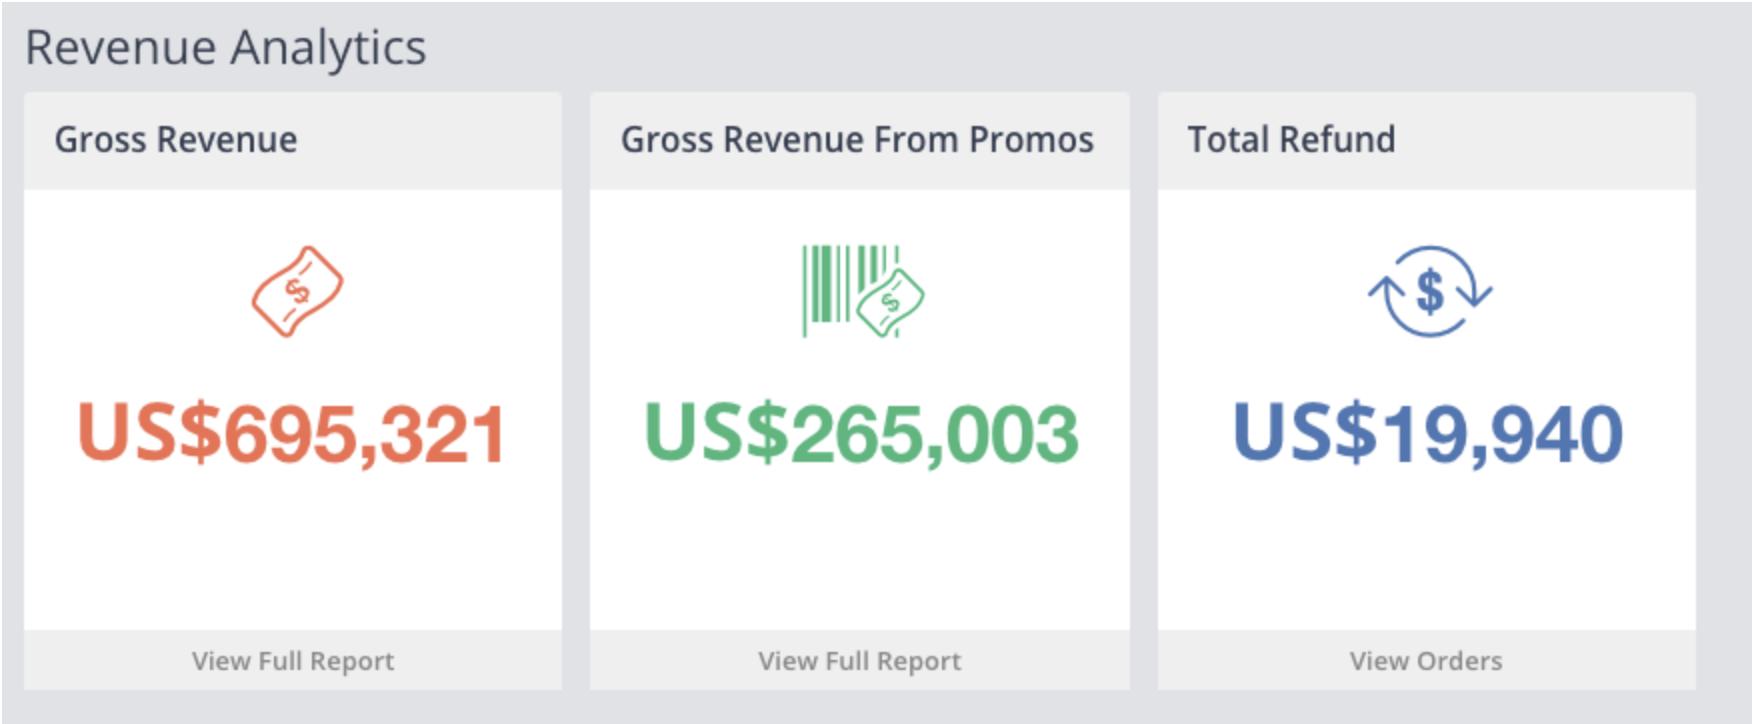 Gross Revenue - KPIs to Measure Event Success